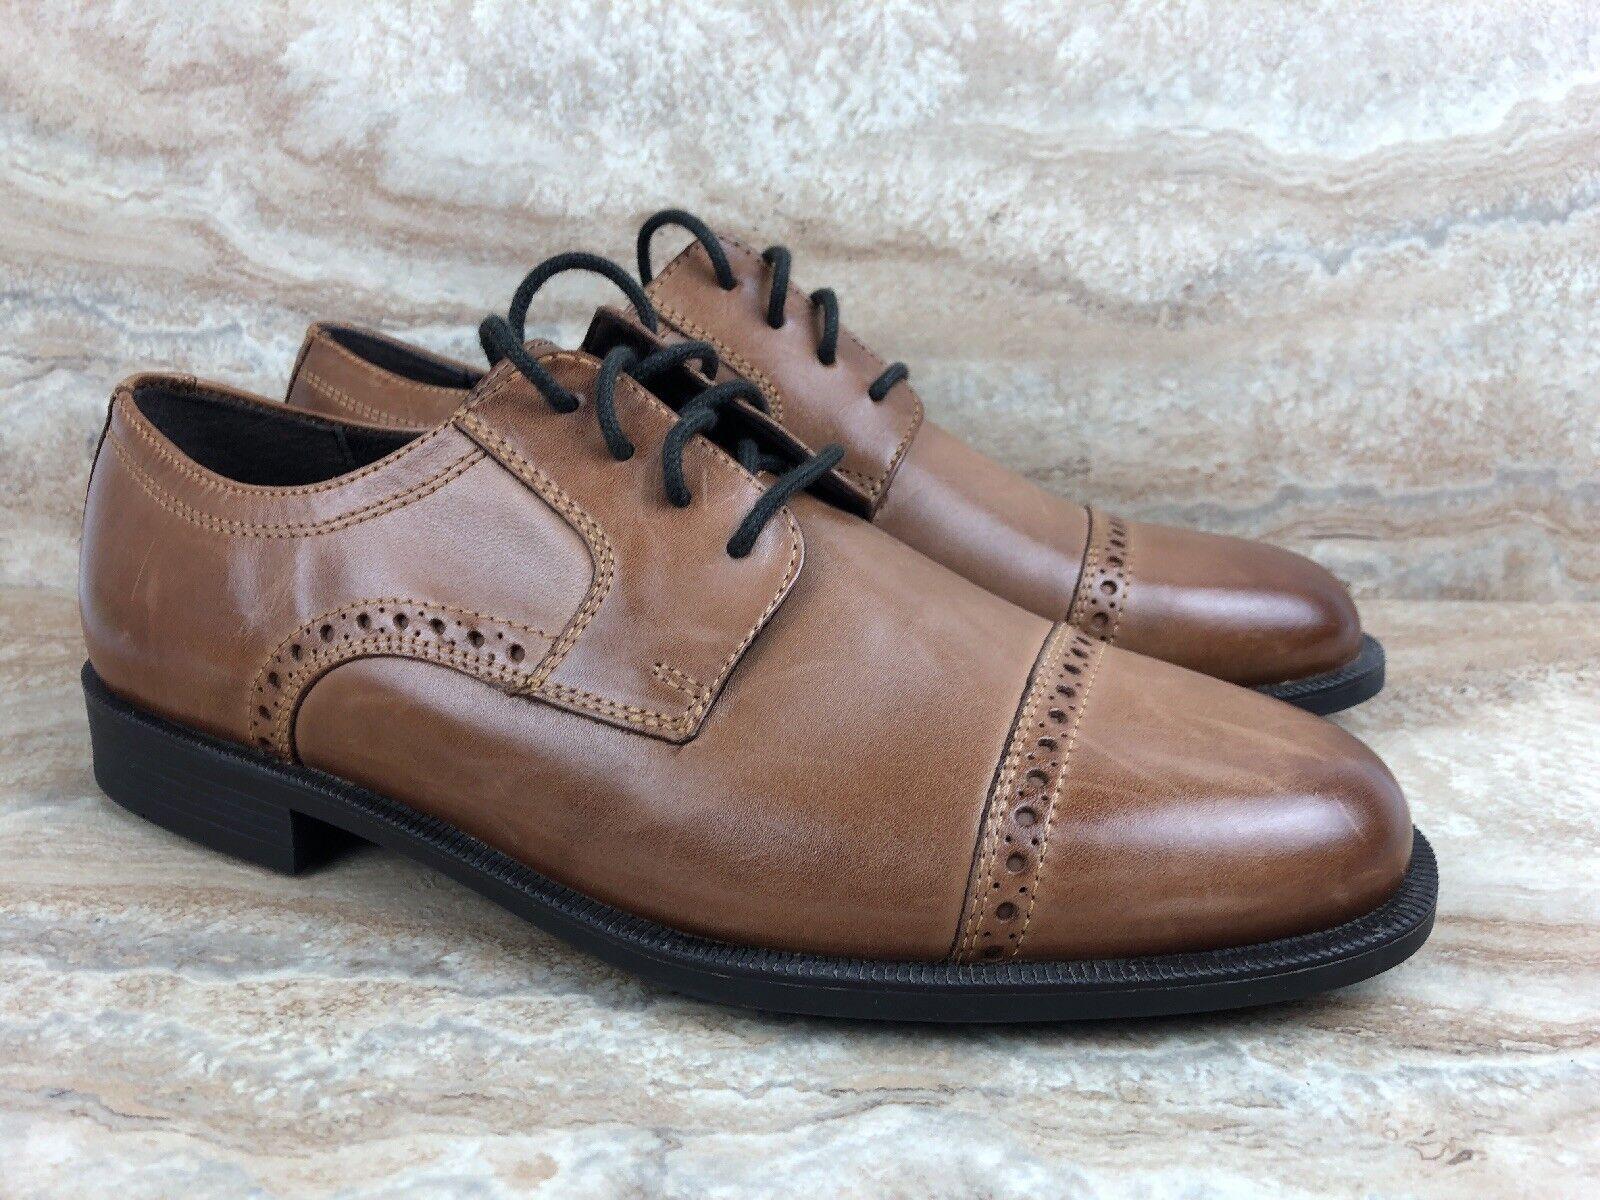 69d3d5fc1dd5f6 Cole Haan Size 8.5 8.5 8.5 M Dustin Cap Brogue Oxford Tan Leather Dress  shoes f4f3ac ...